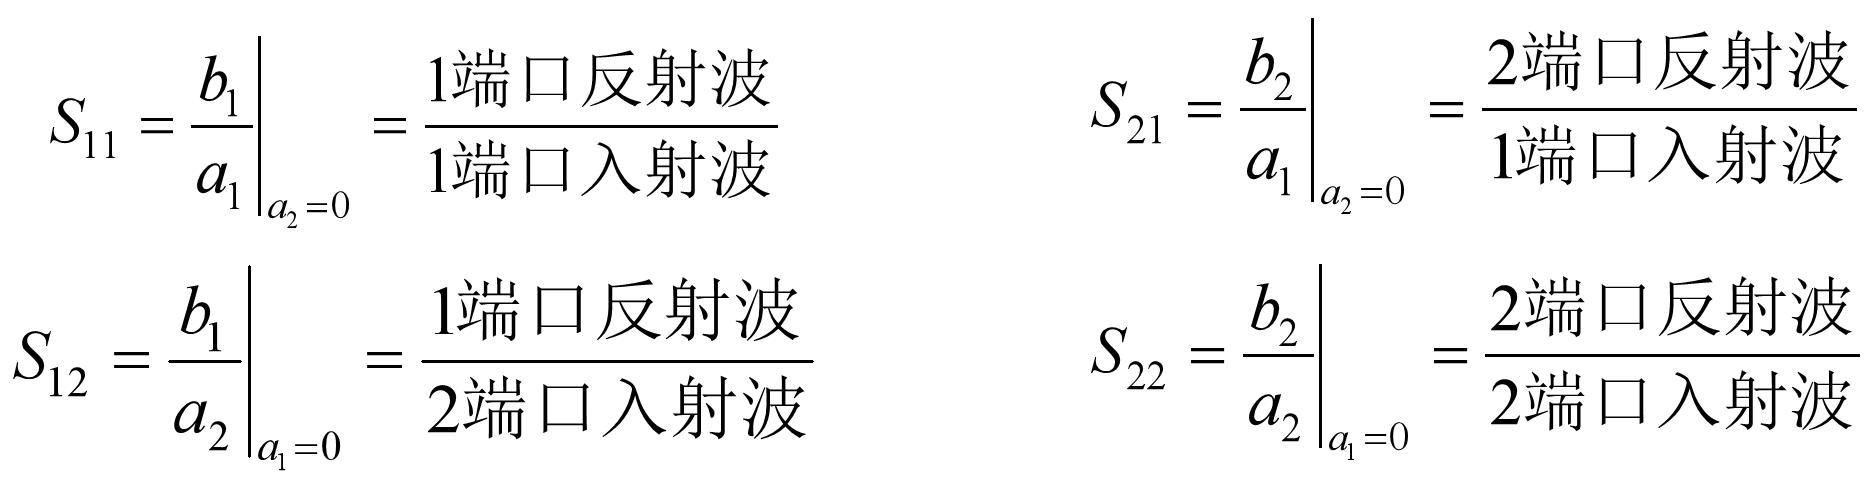 S参数定义1